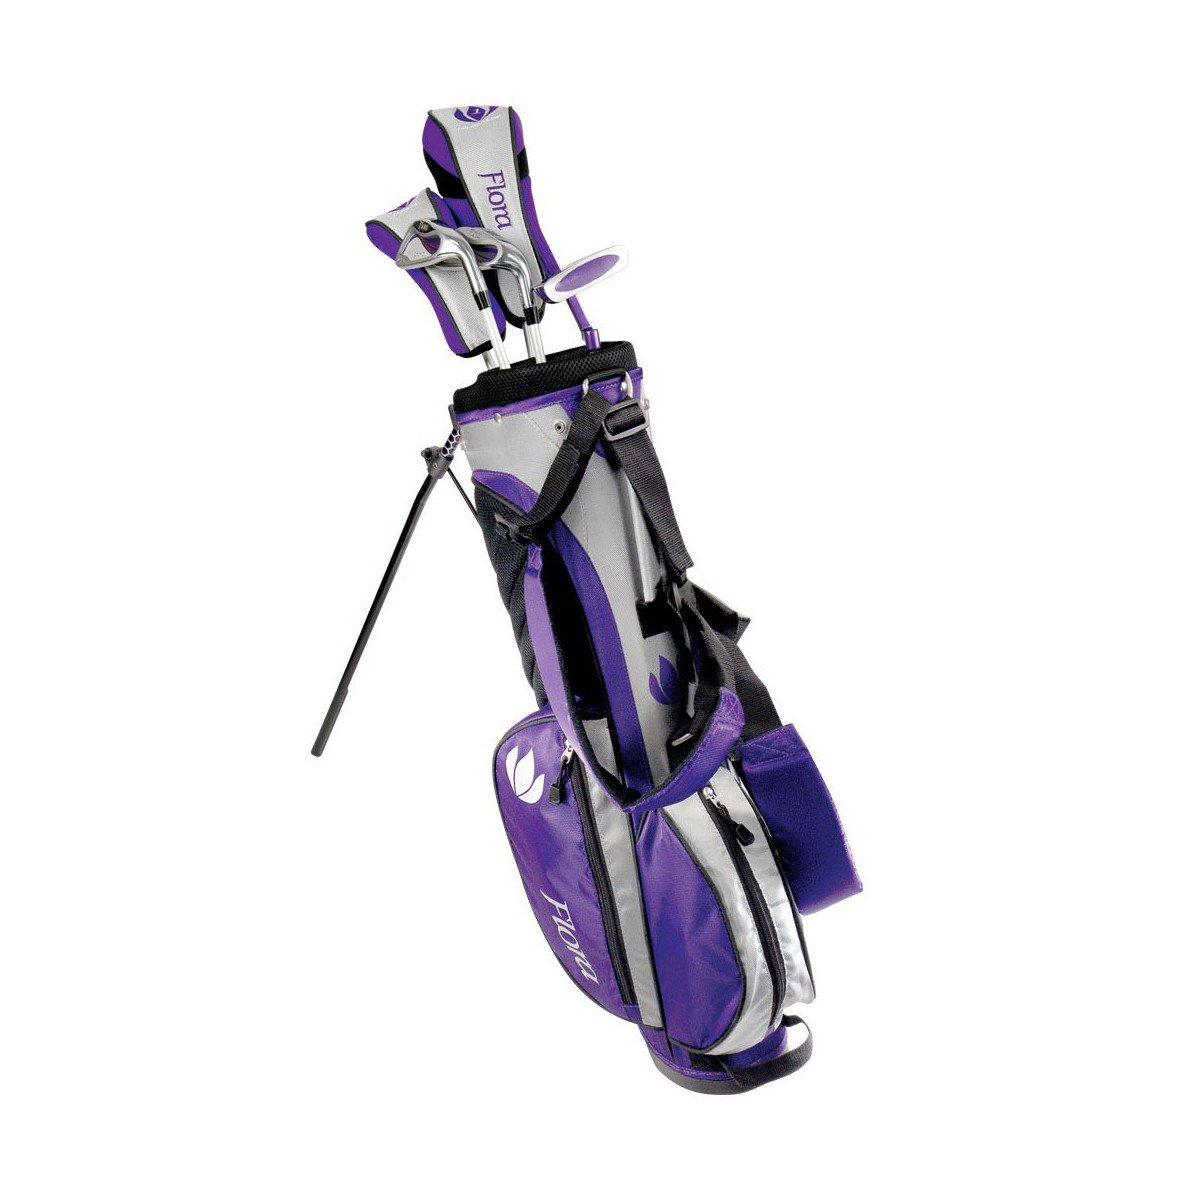 Intech Flora Junior Girls Golf Club Set (Right-Handed, Age 8-12)